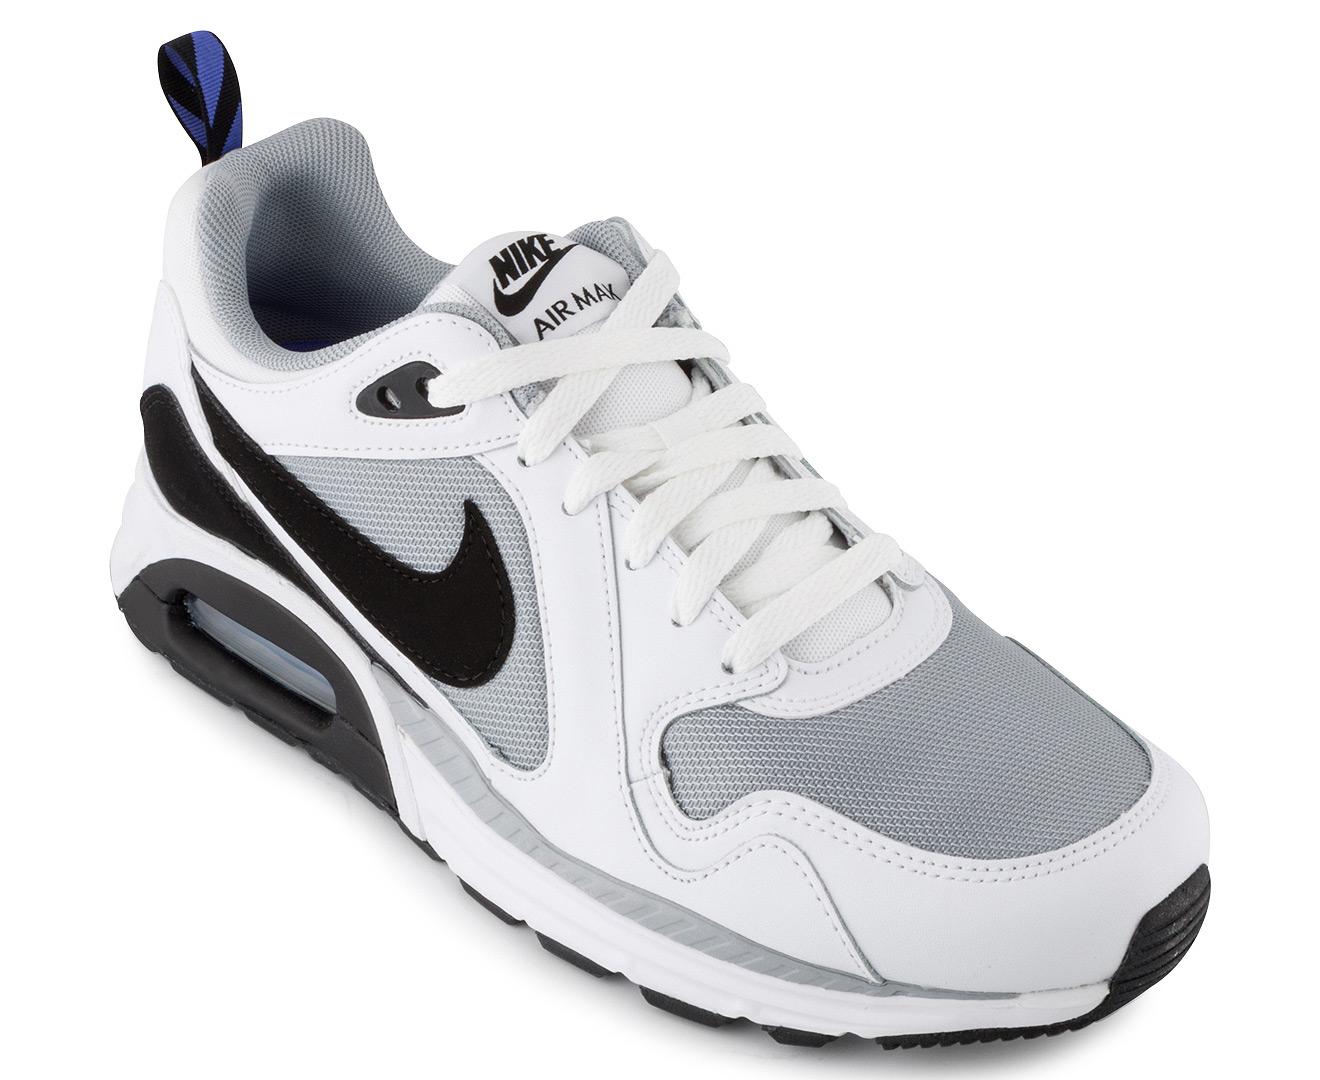 pánico piloto Rascacielos  Nike Air Max Trax Leather Men's Shoe - Wolf Grey/Black/White/Violet |  Catch.com.au